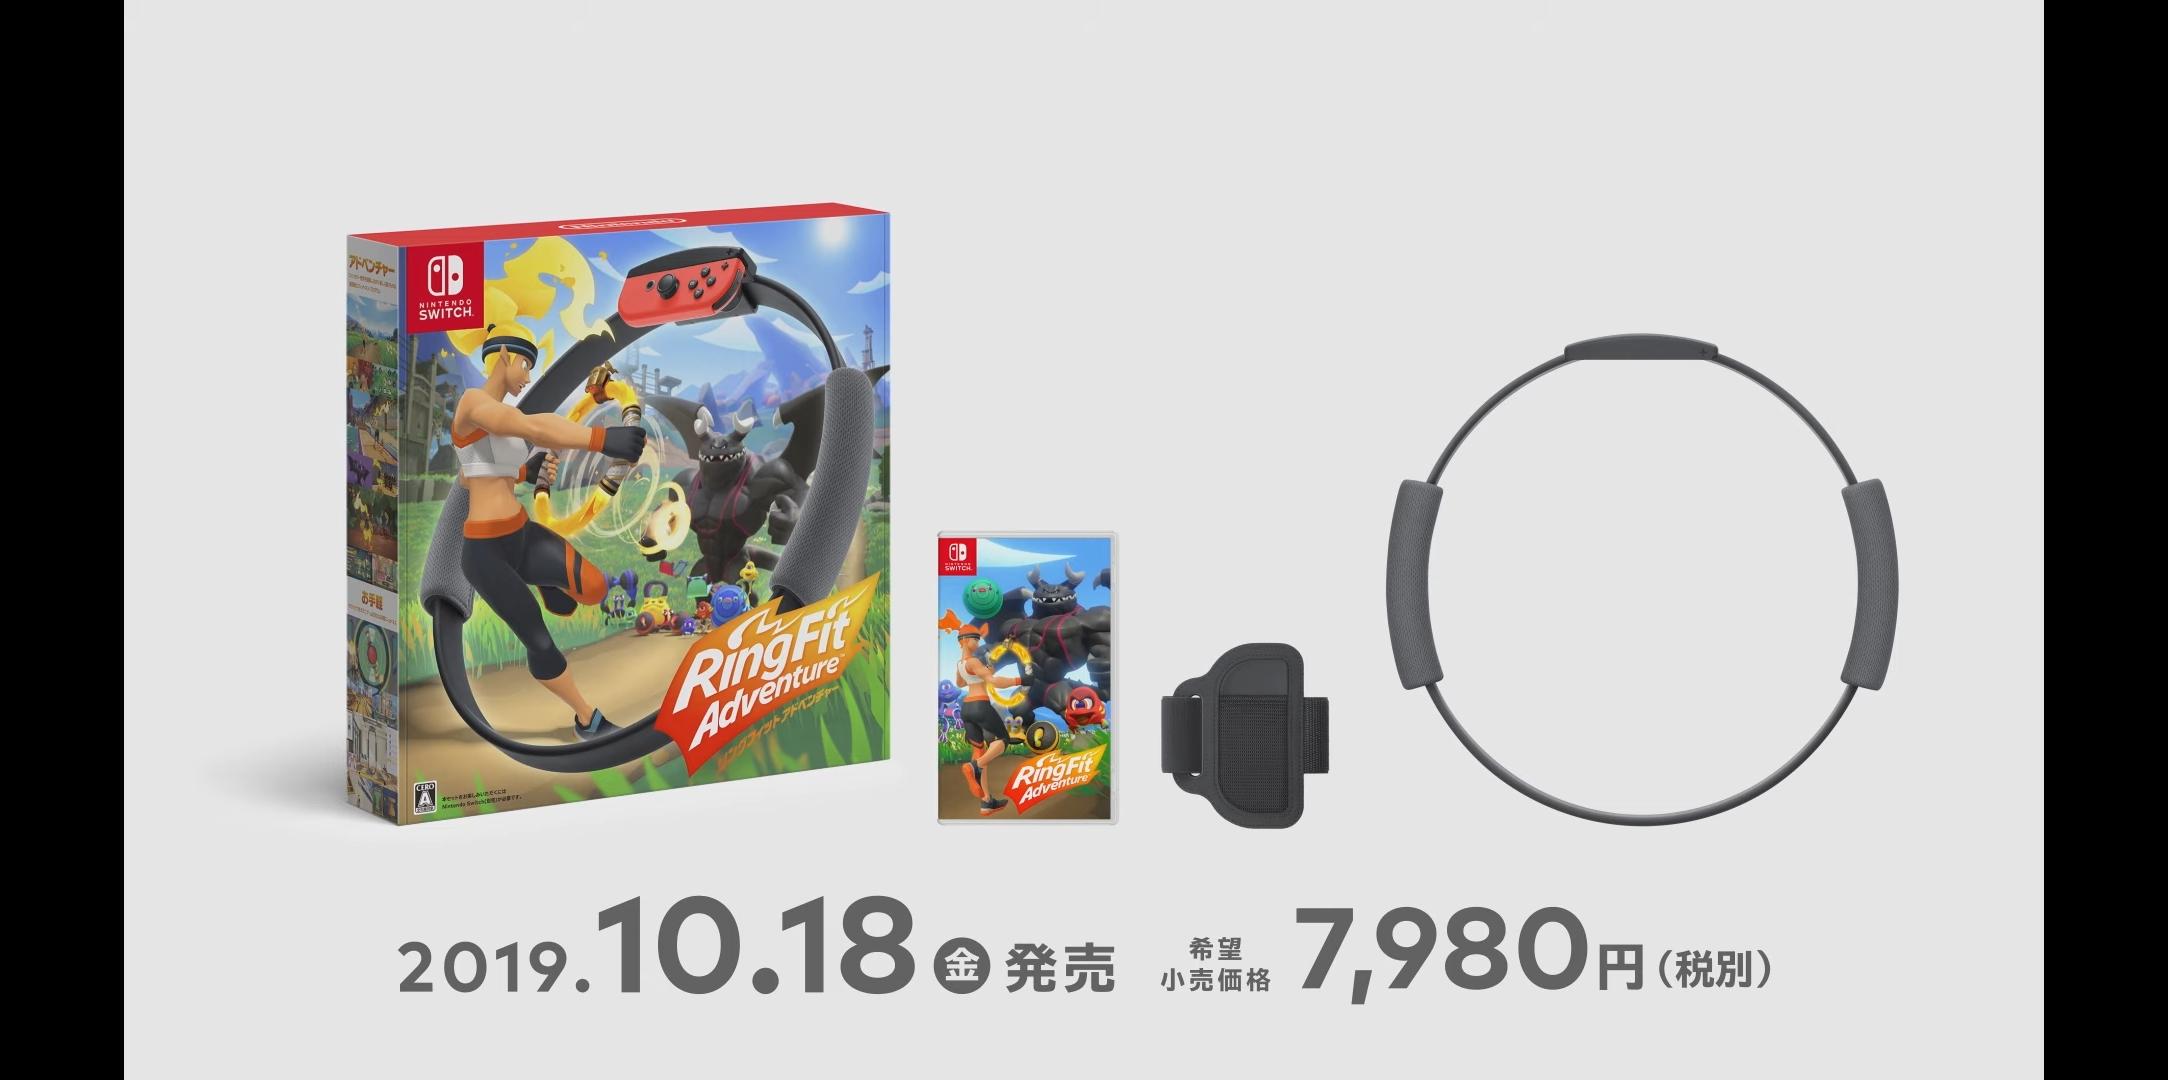 uQLFFA3 - Nintendo Switch『リングフィット アドベンチャー』10月18日発売決定 ★2